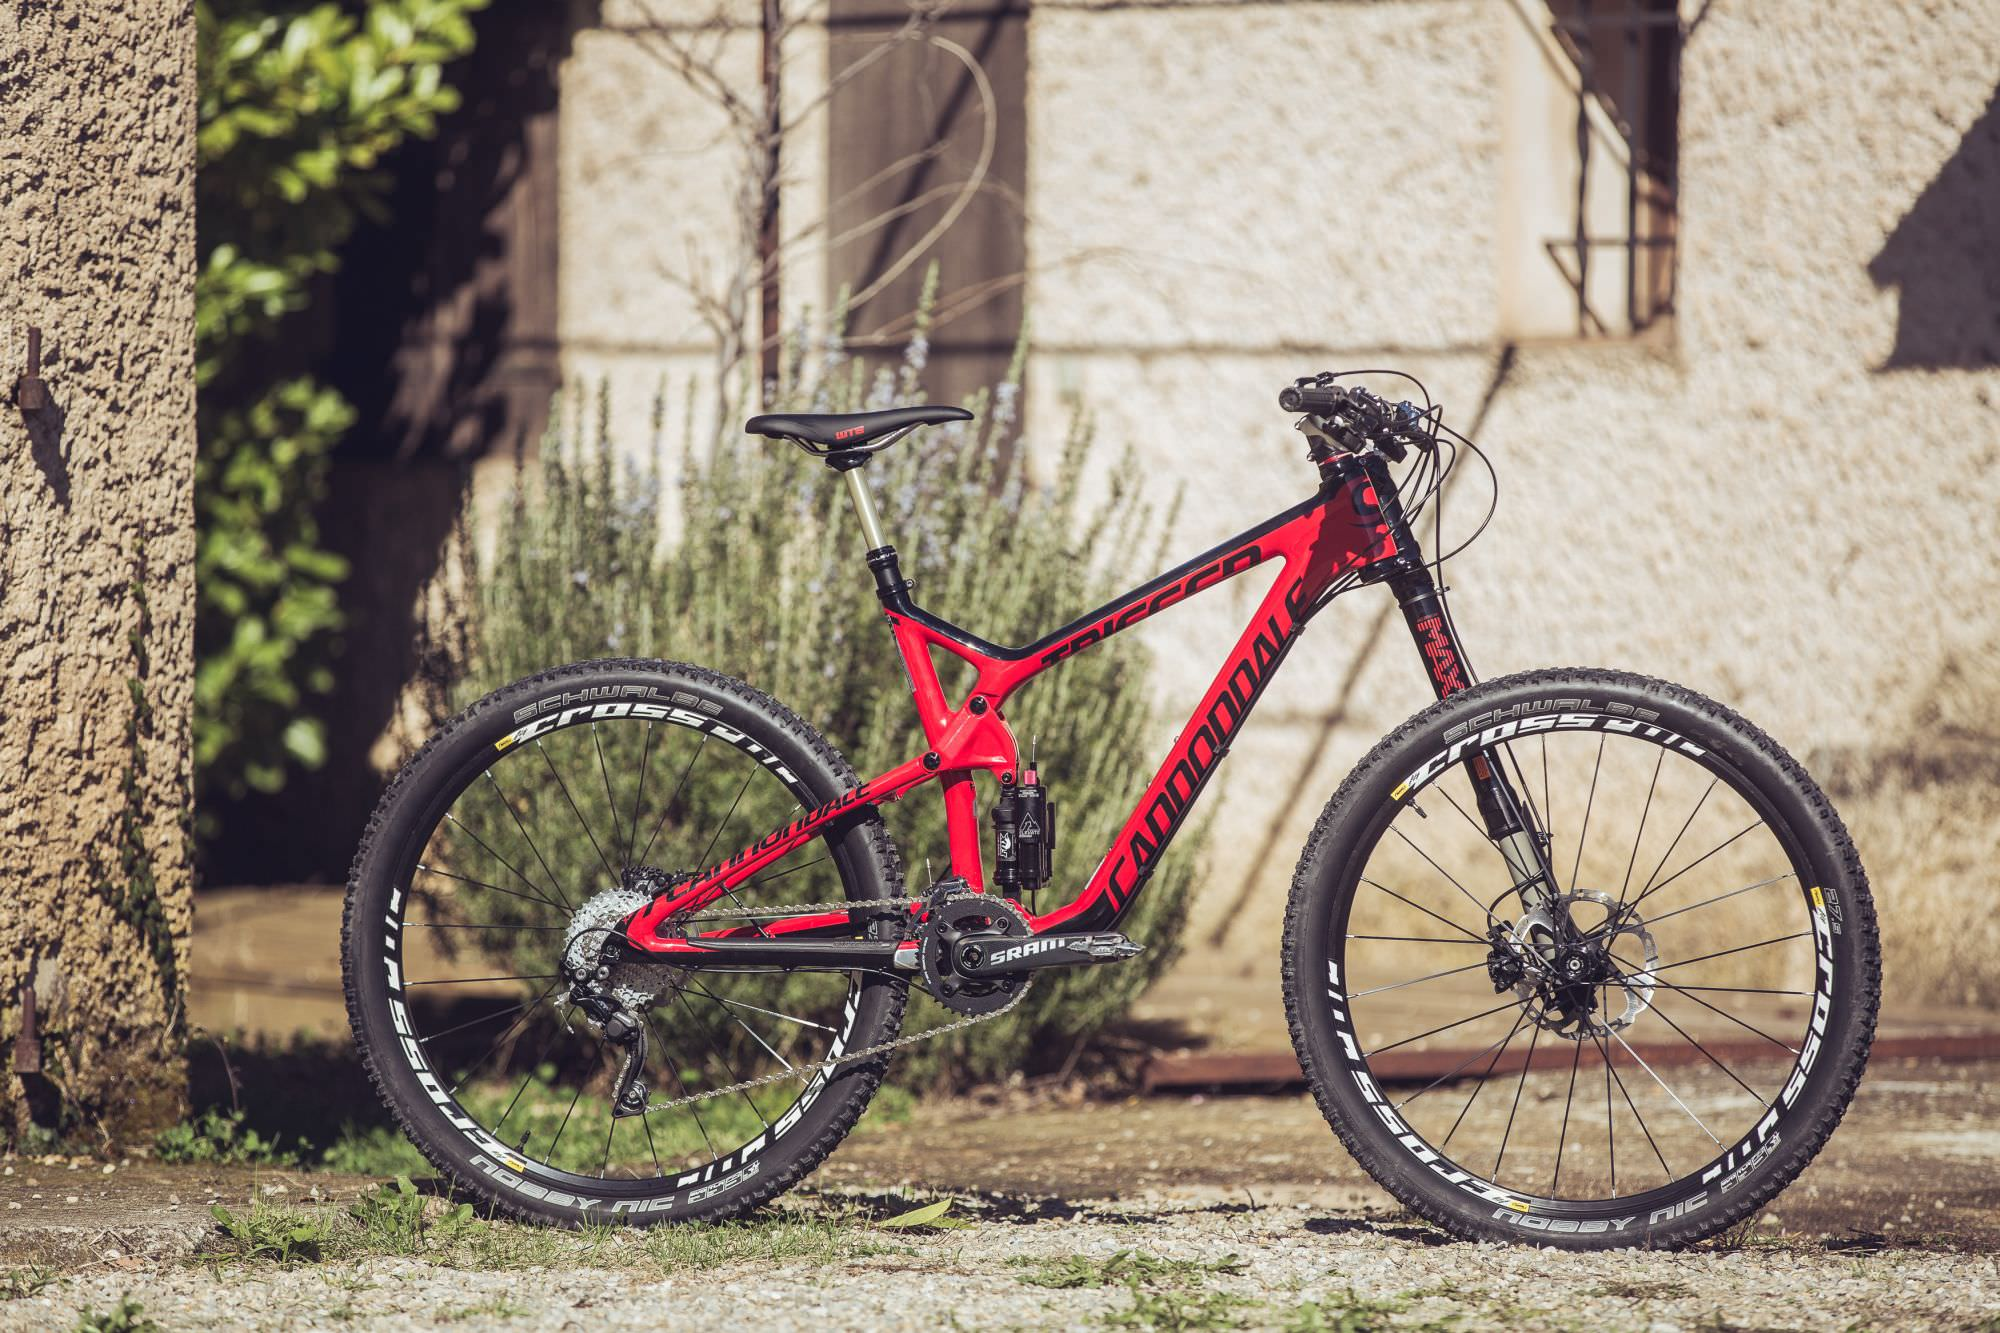 97cbd14a77b Cannondale Trigger Carbon 2 Review | ENDURO Mountainbike Magazine